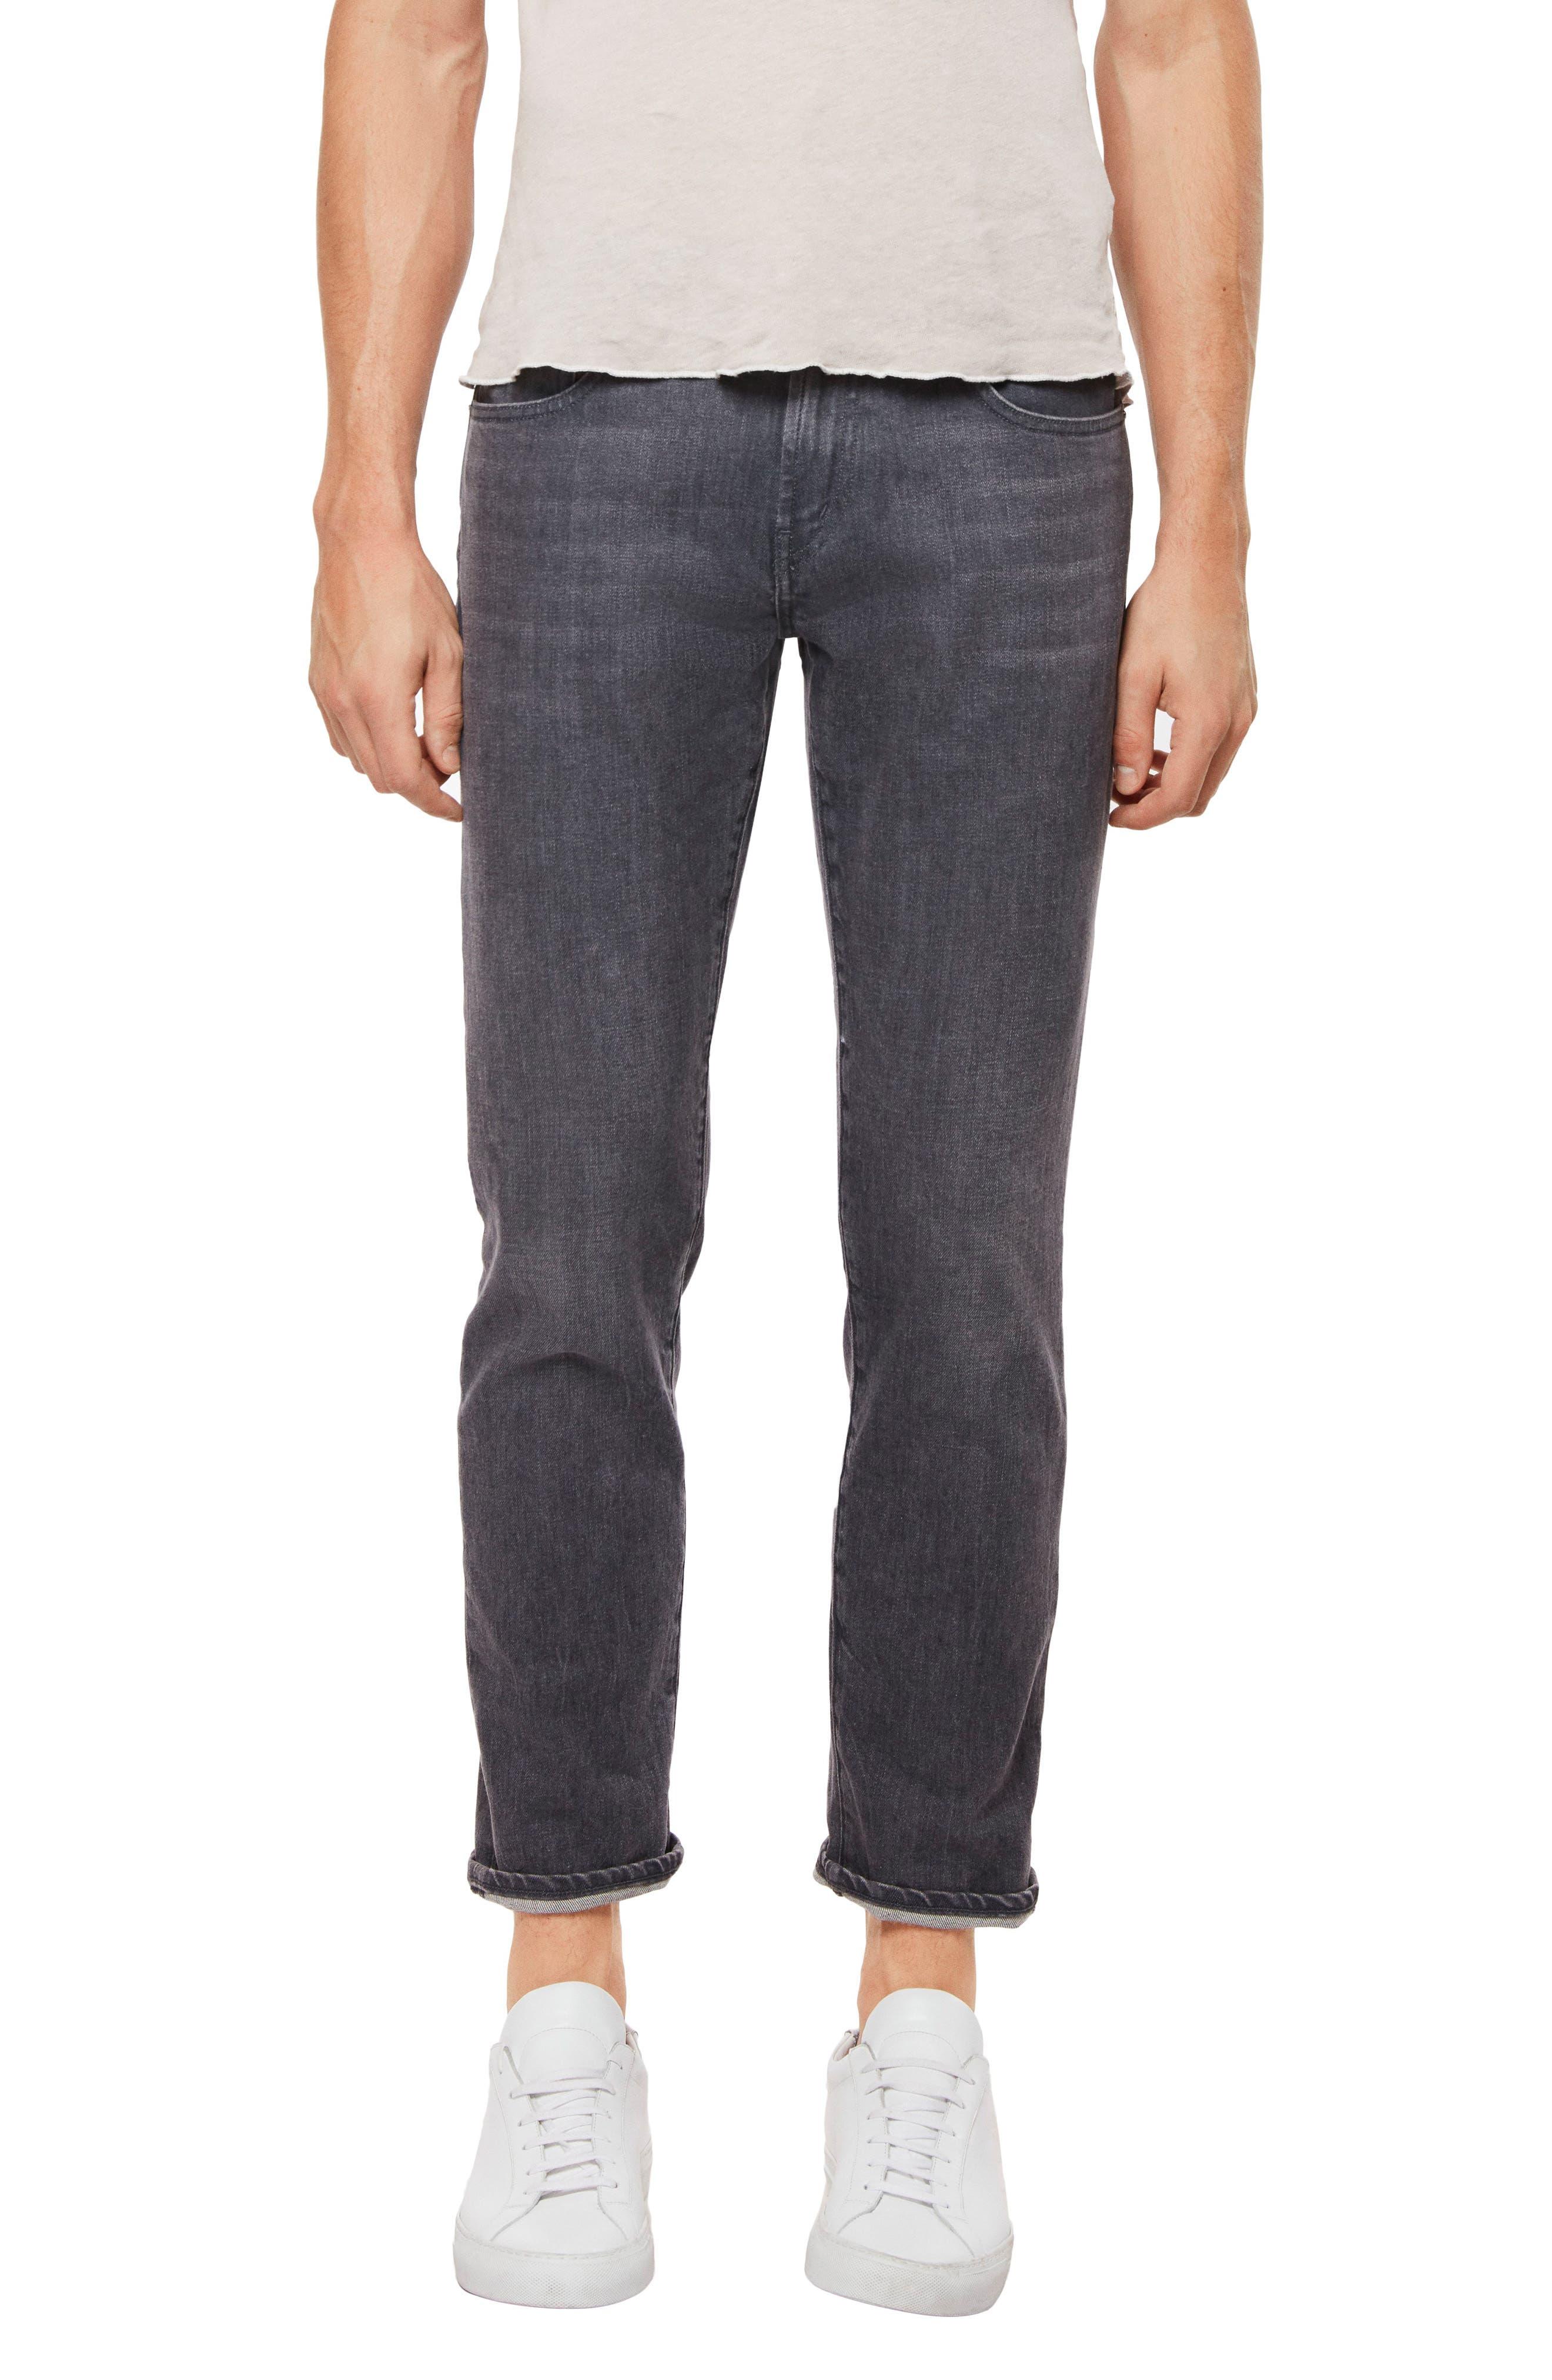 Eli Slim Fit Jeans,                             Main thumbnail 1, color,                             Topography